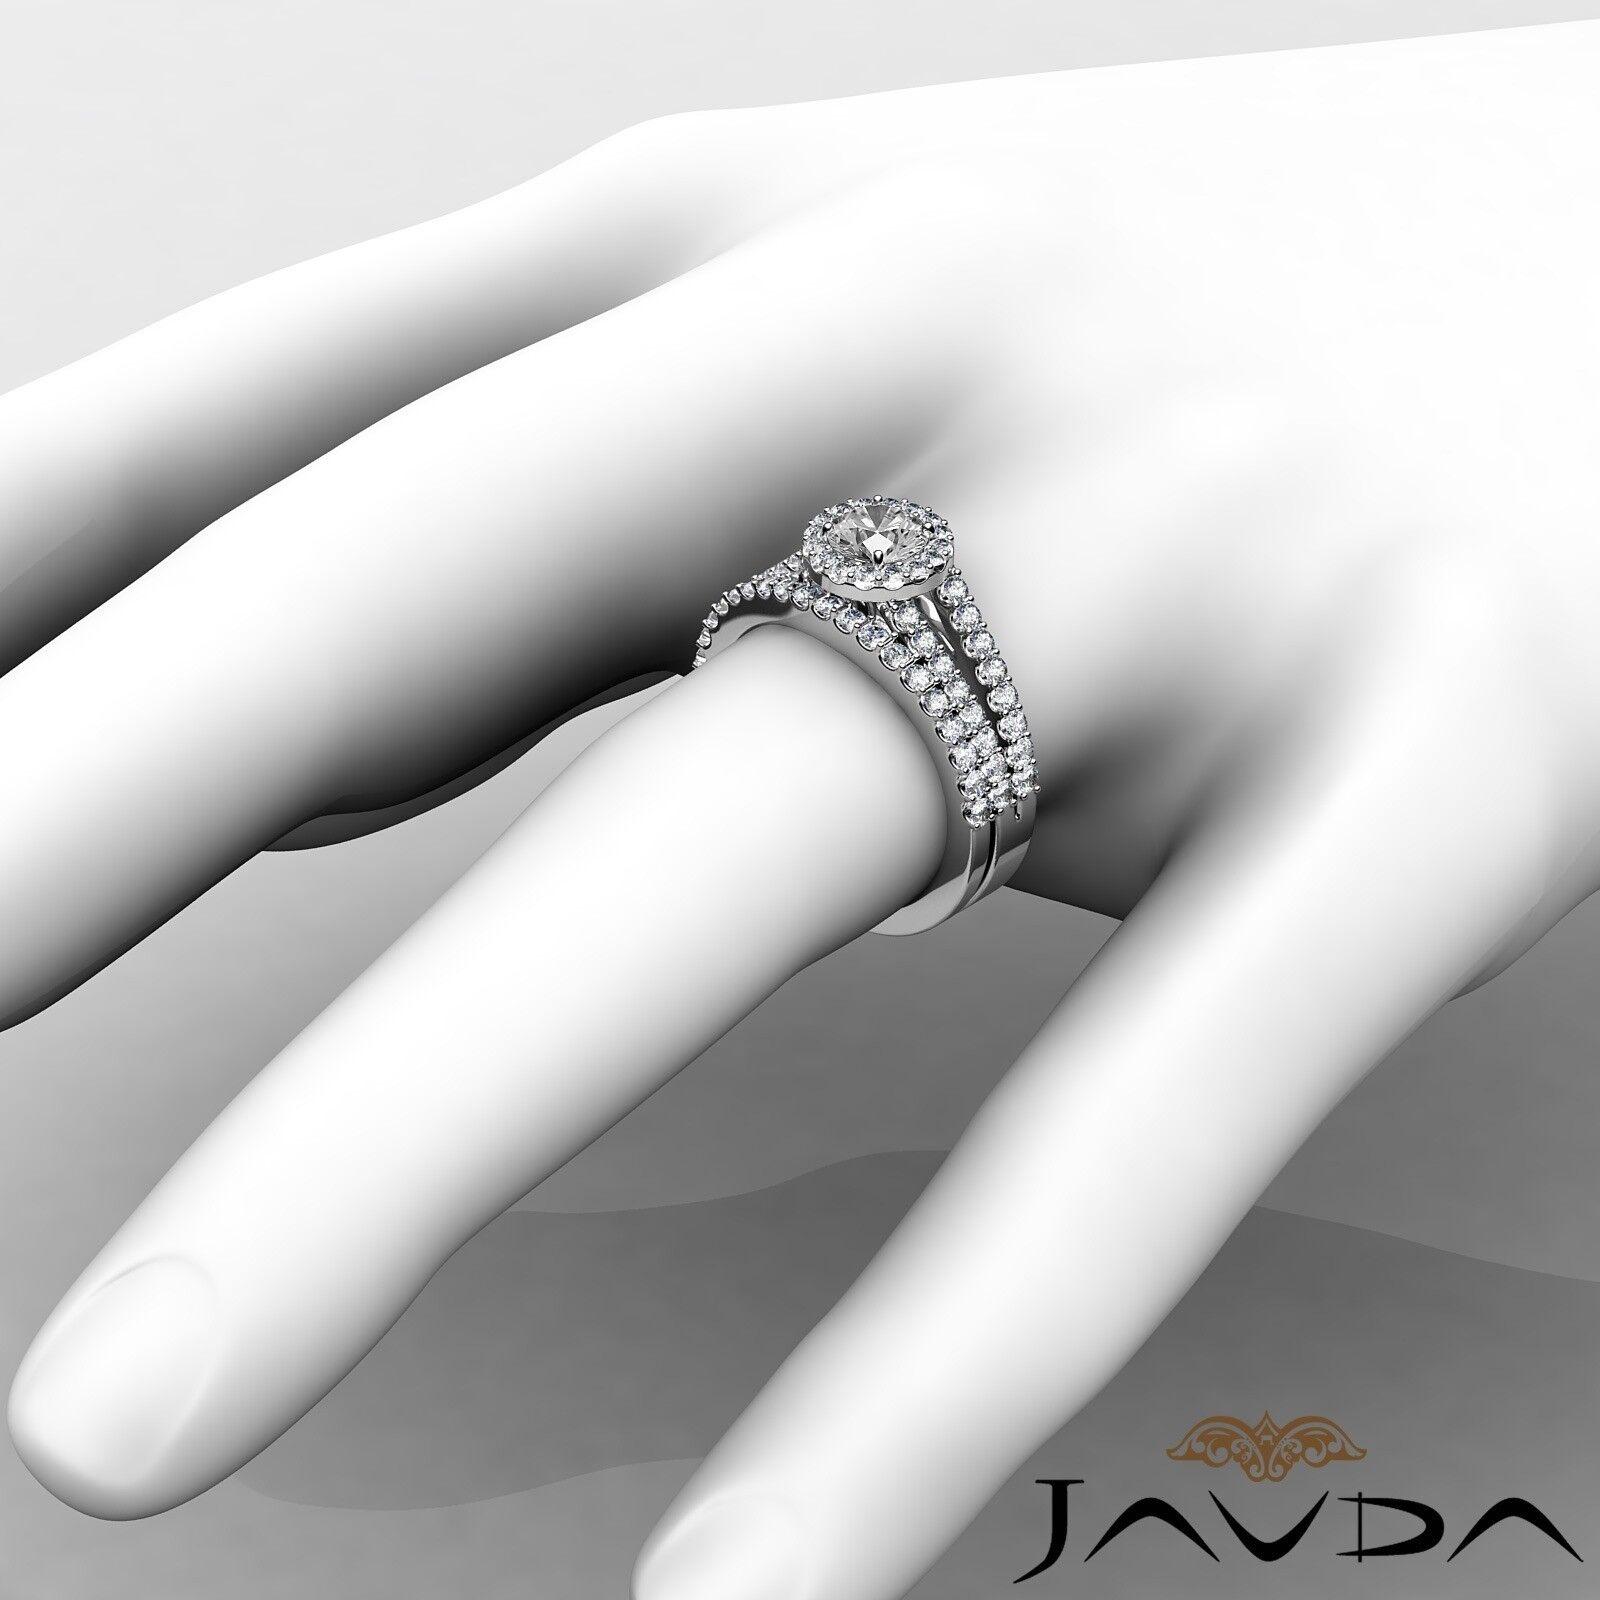 1.85ctw Luxurious Wedding Bridal Round Diamond Engagement Ring GIA G-VVS1 W Gold 4